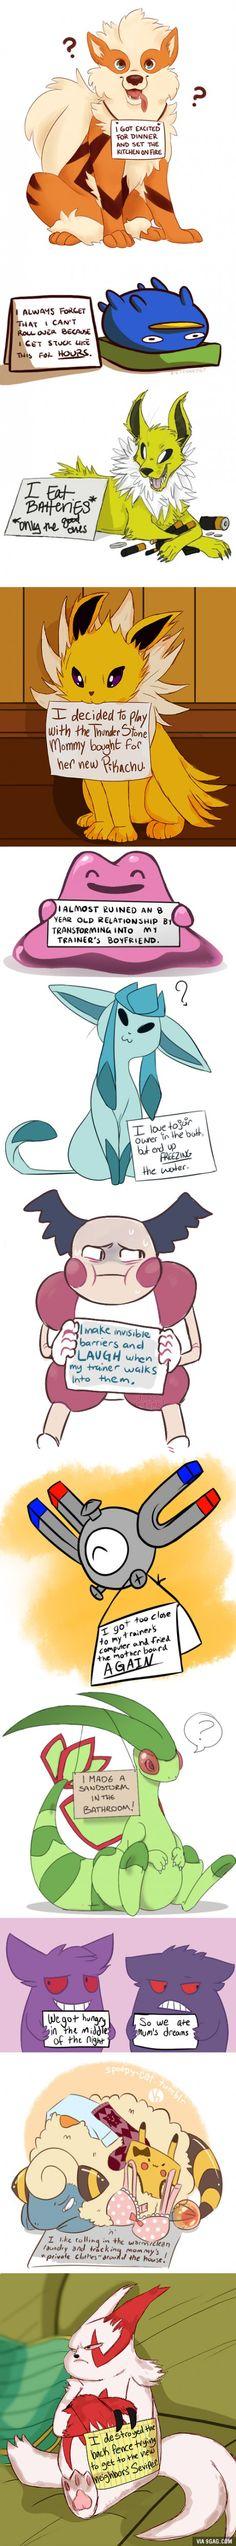 Animal Shaming,Pokémon style